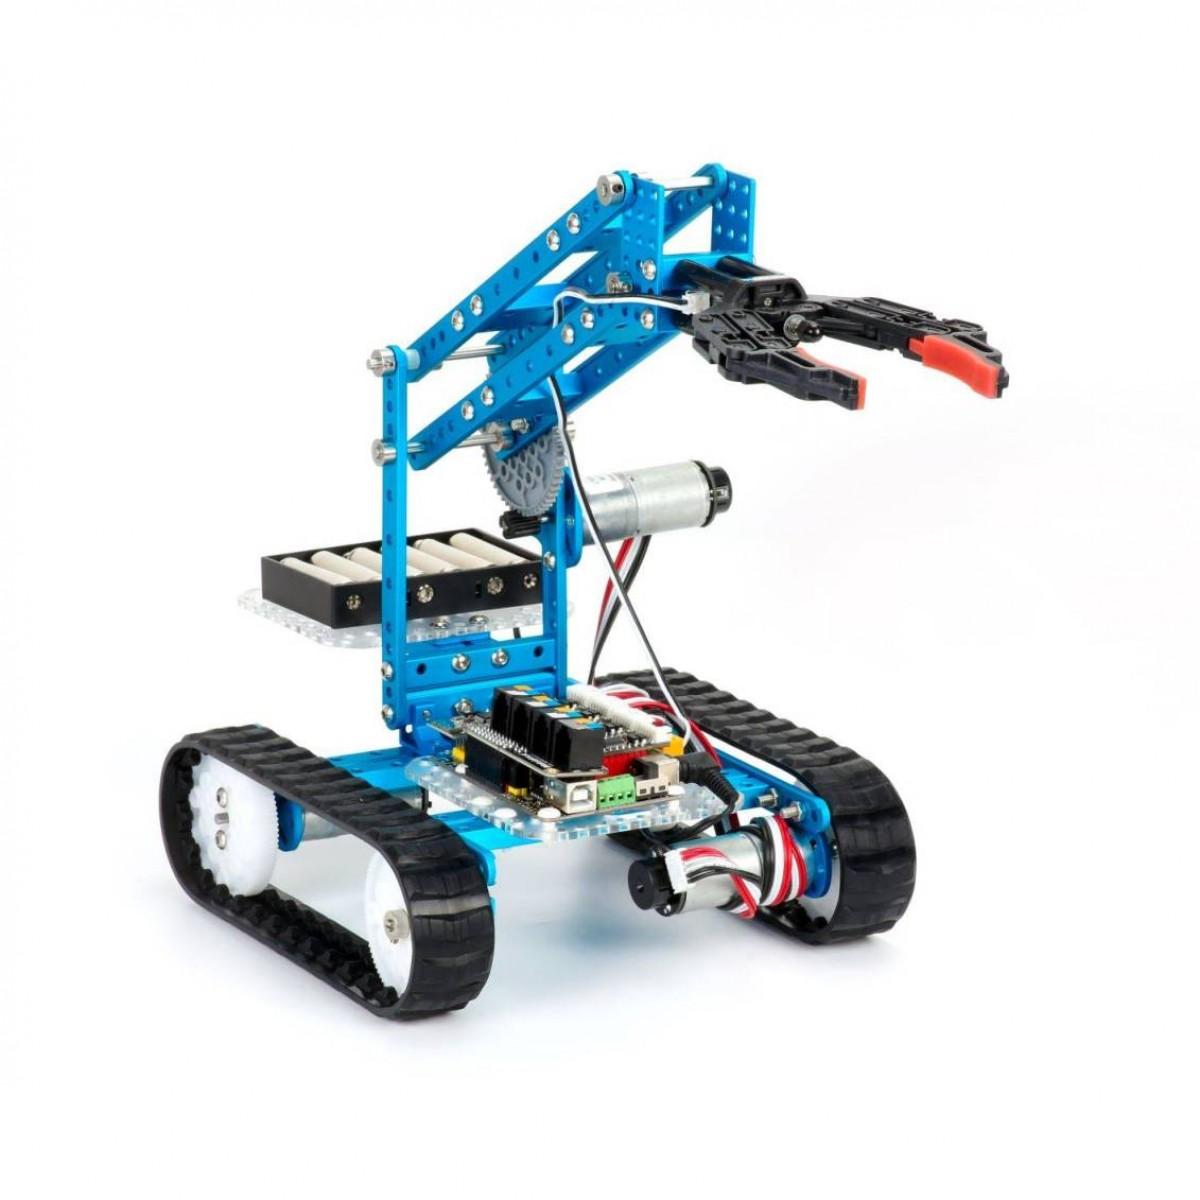 Makeblock mBot Ultimate 2 0 10-in-1 Robotics Kit